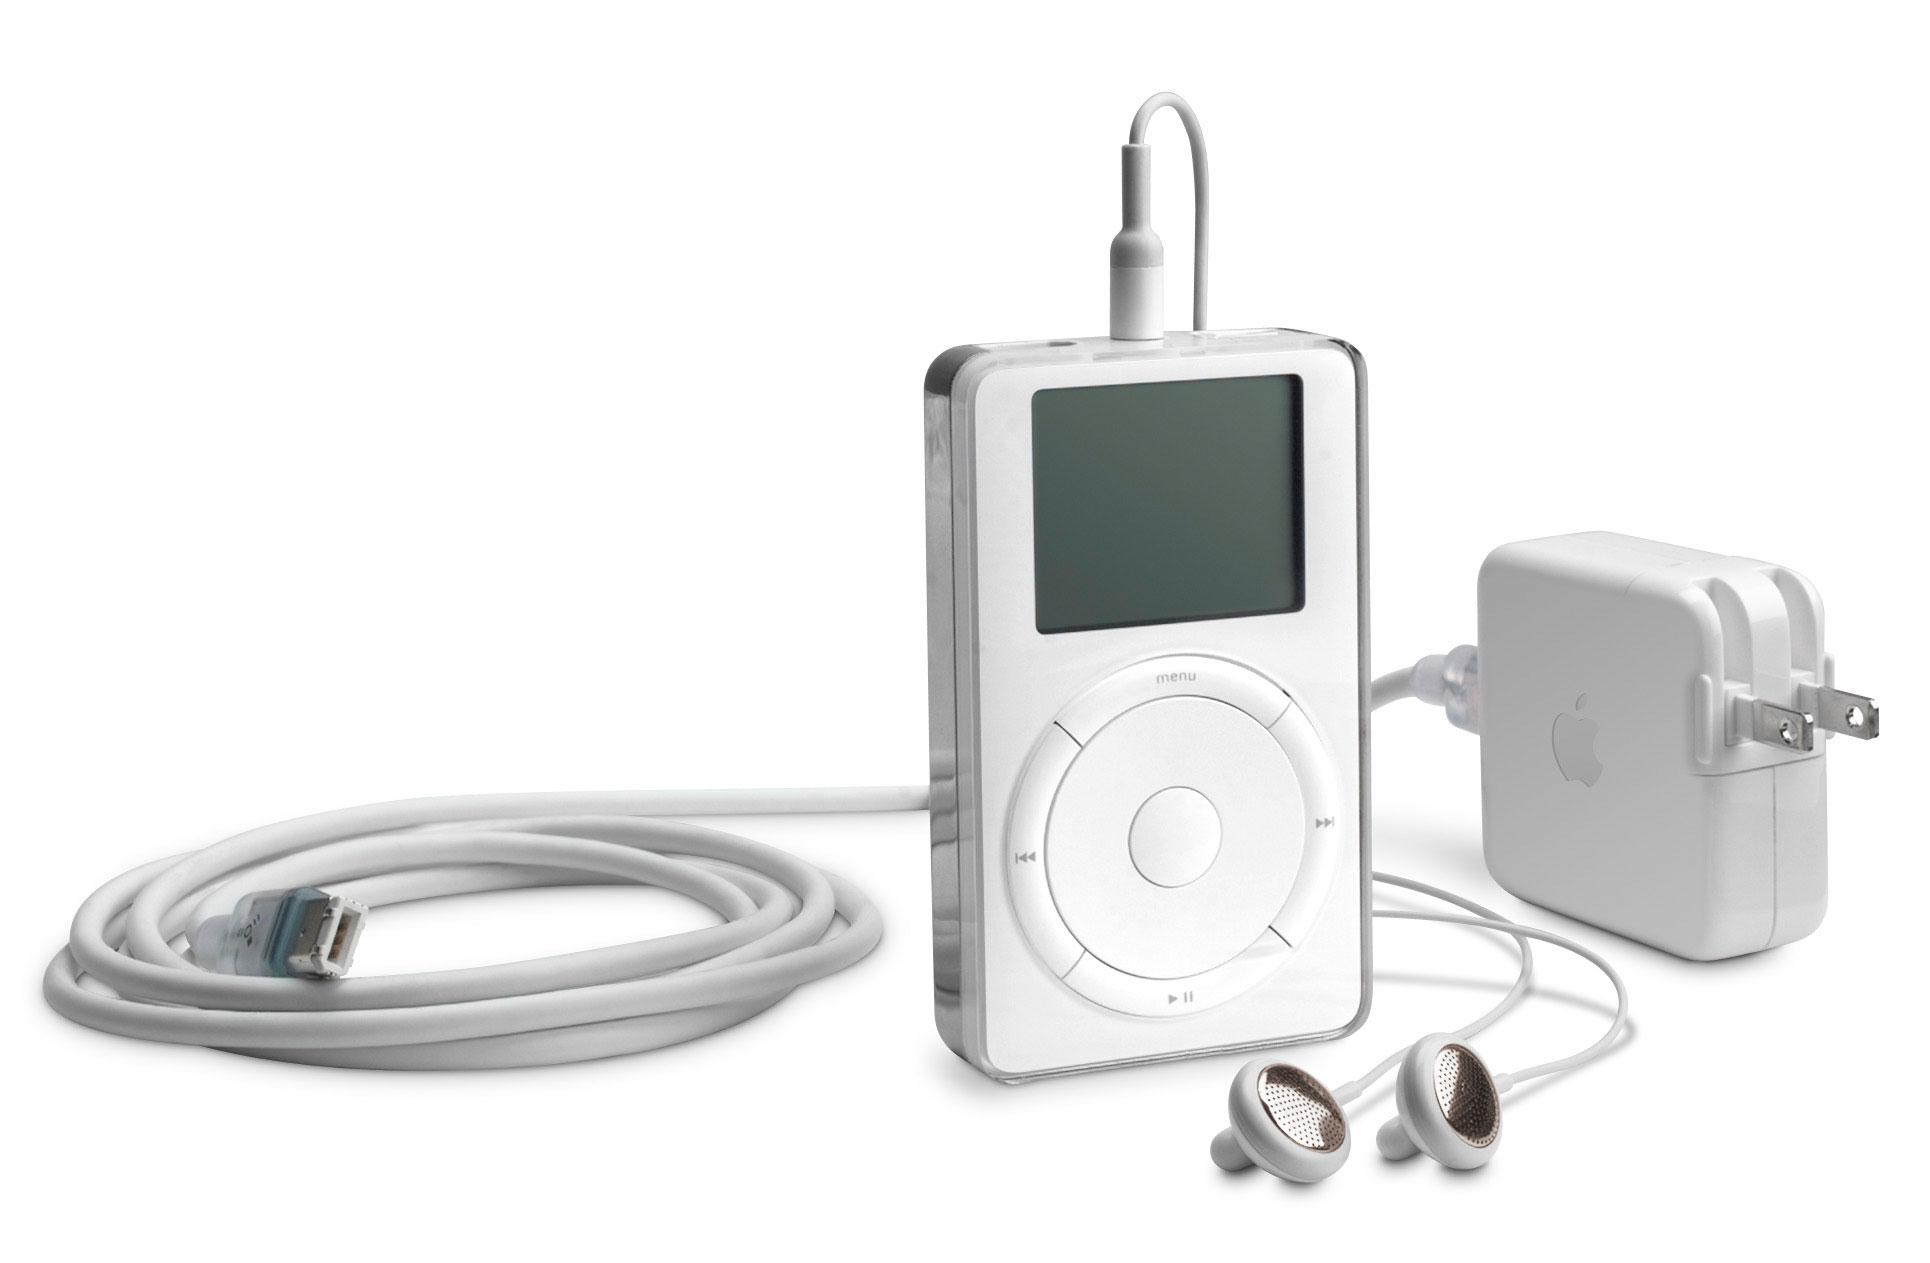 ipod-first-gen-5gb-accessories